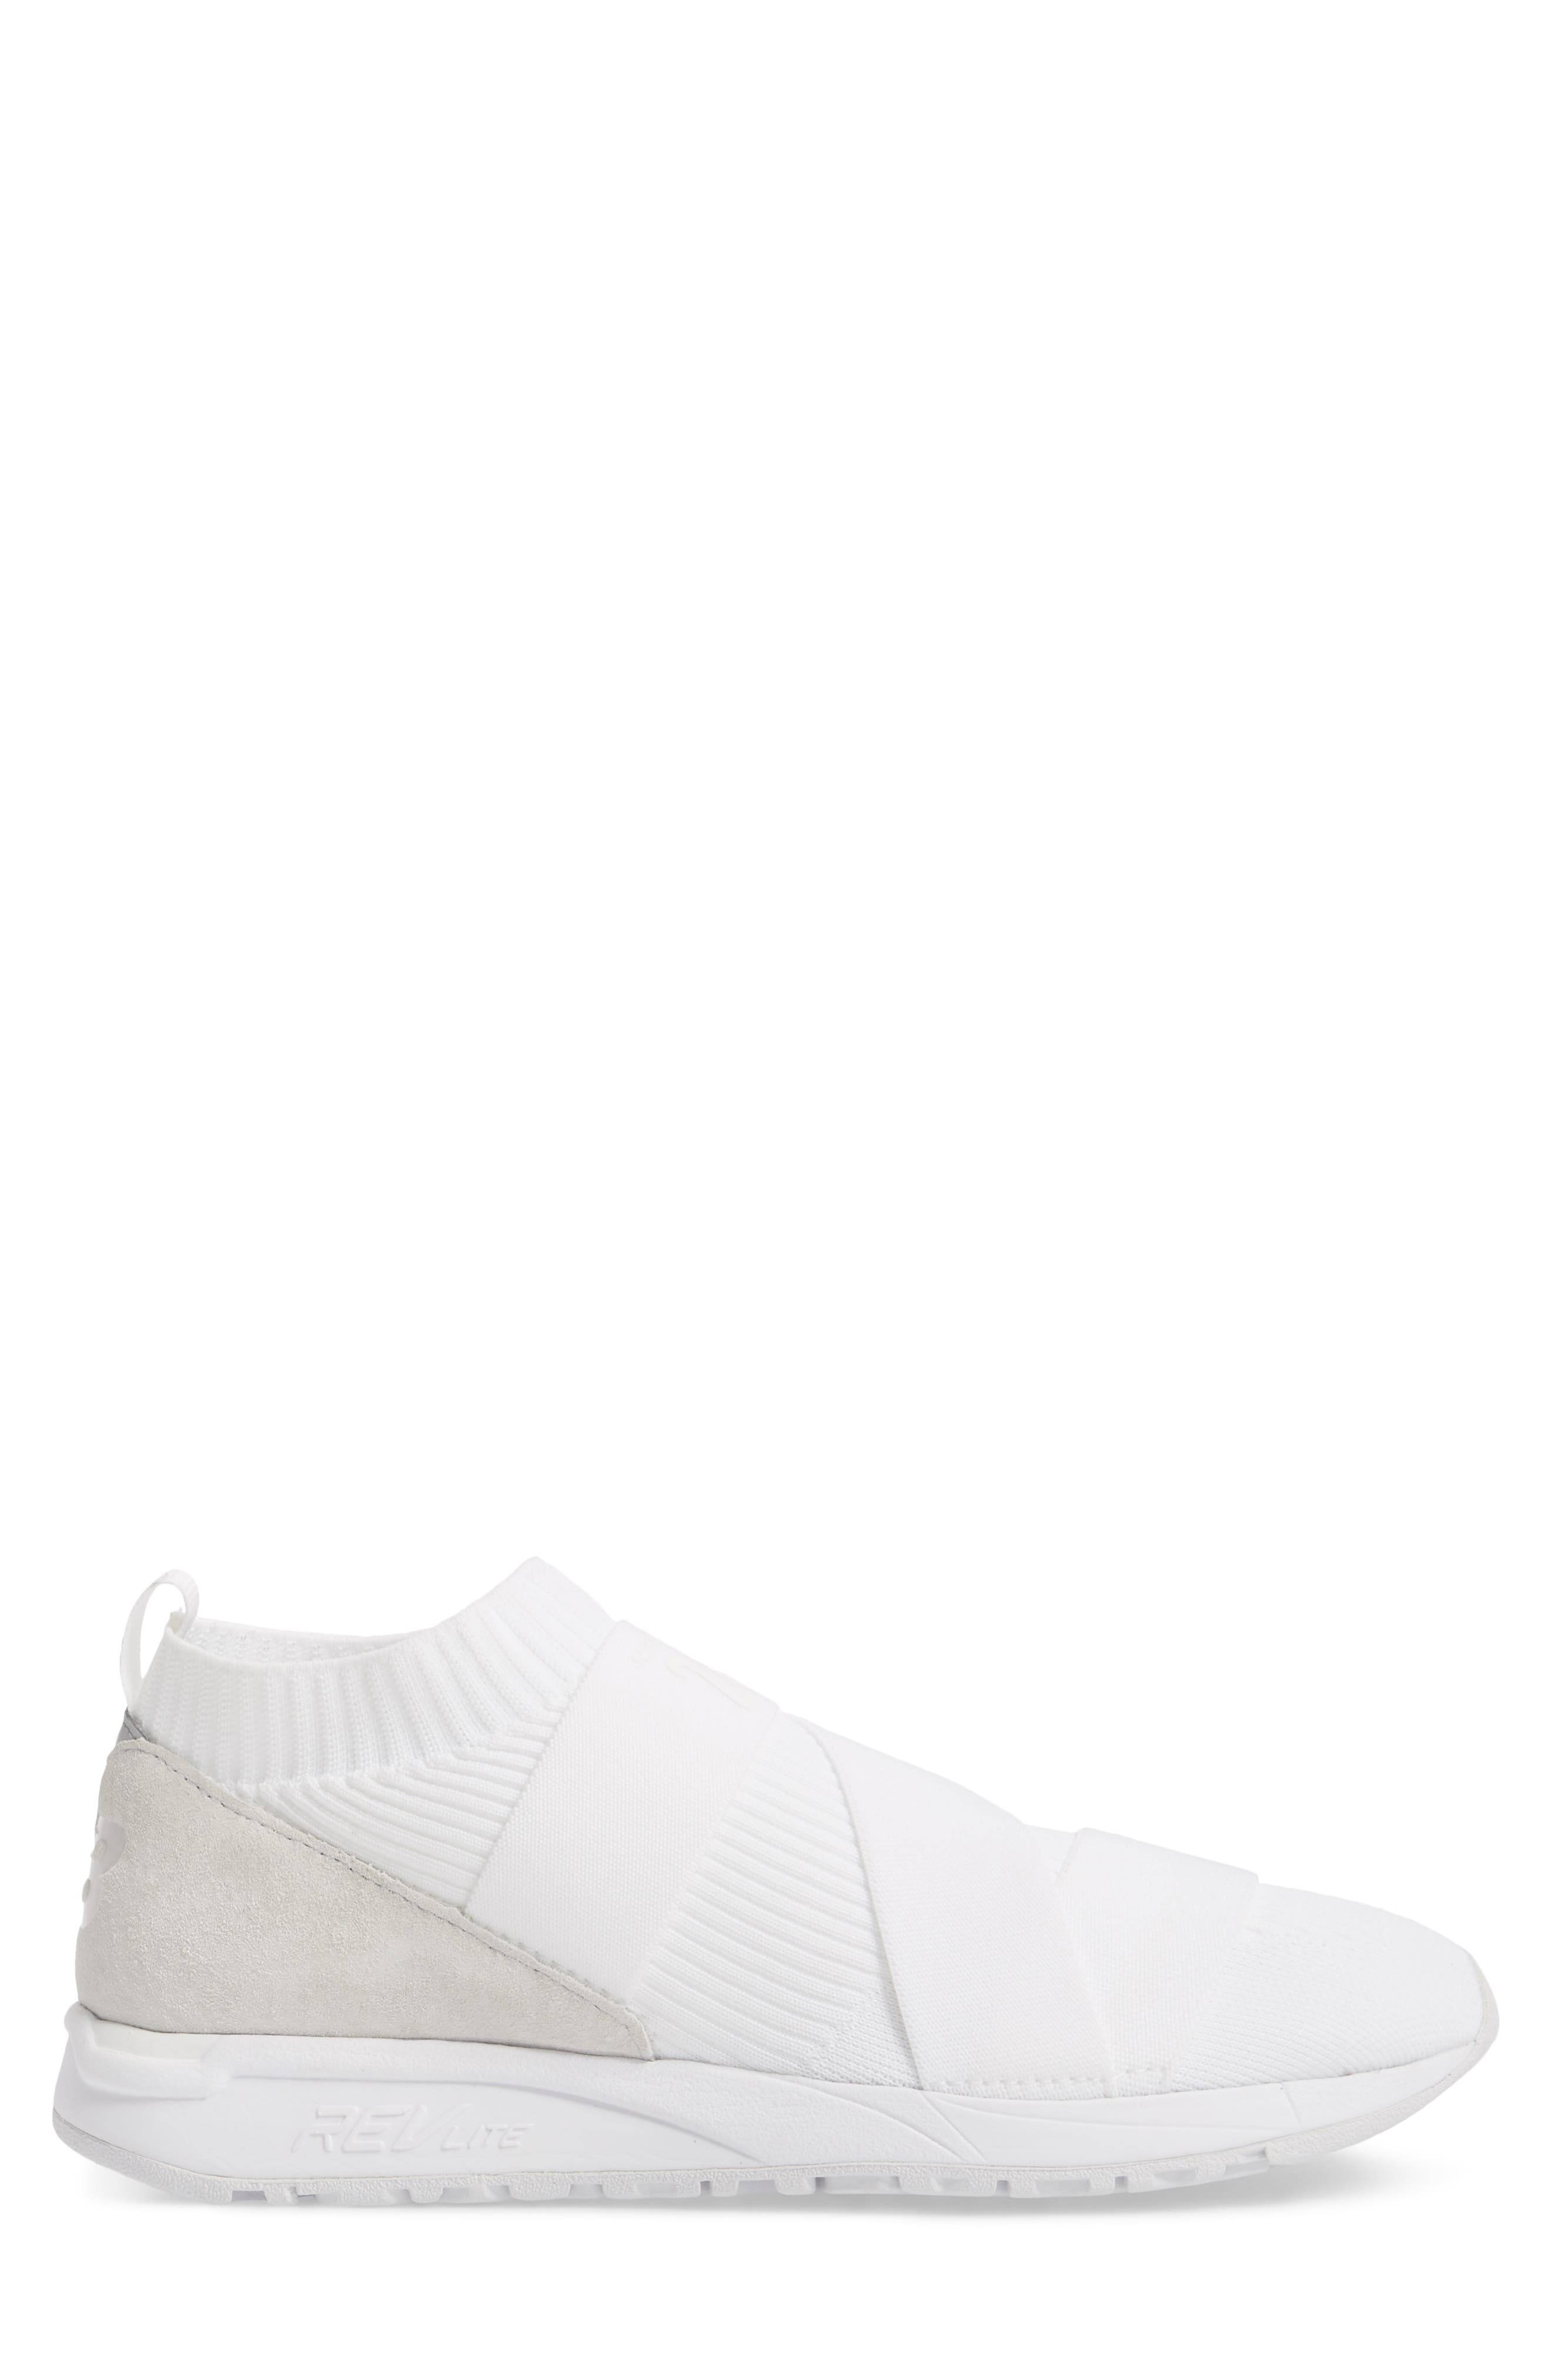 247 Knit Sneaker,                             Alternate thumbnail 3, color,                             WHITE